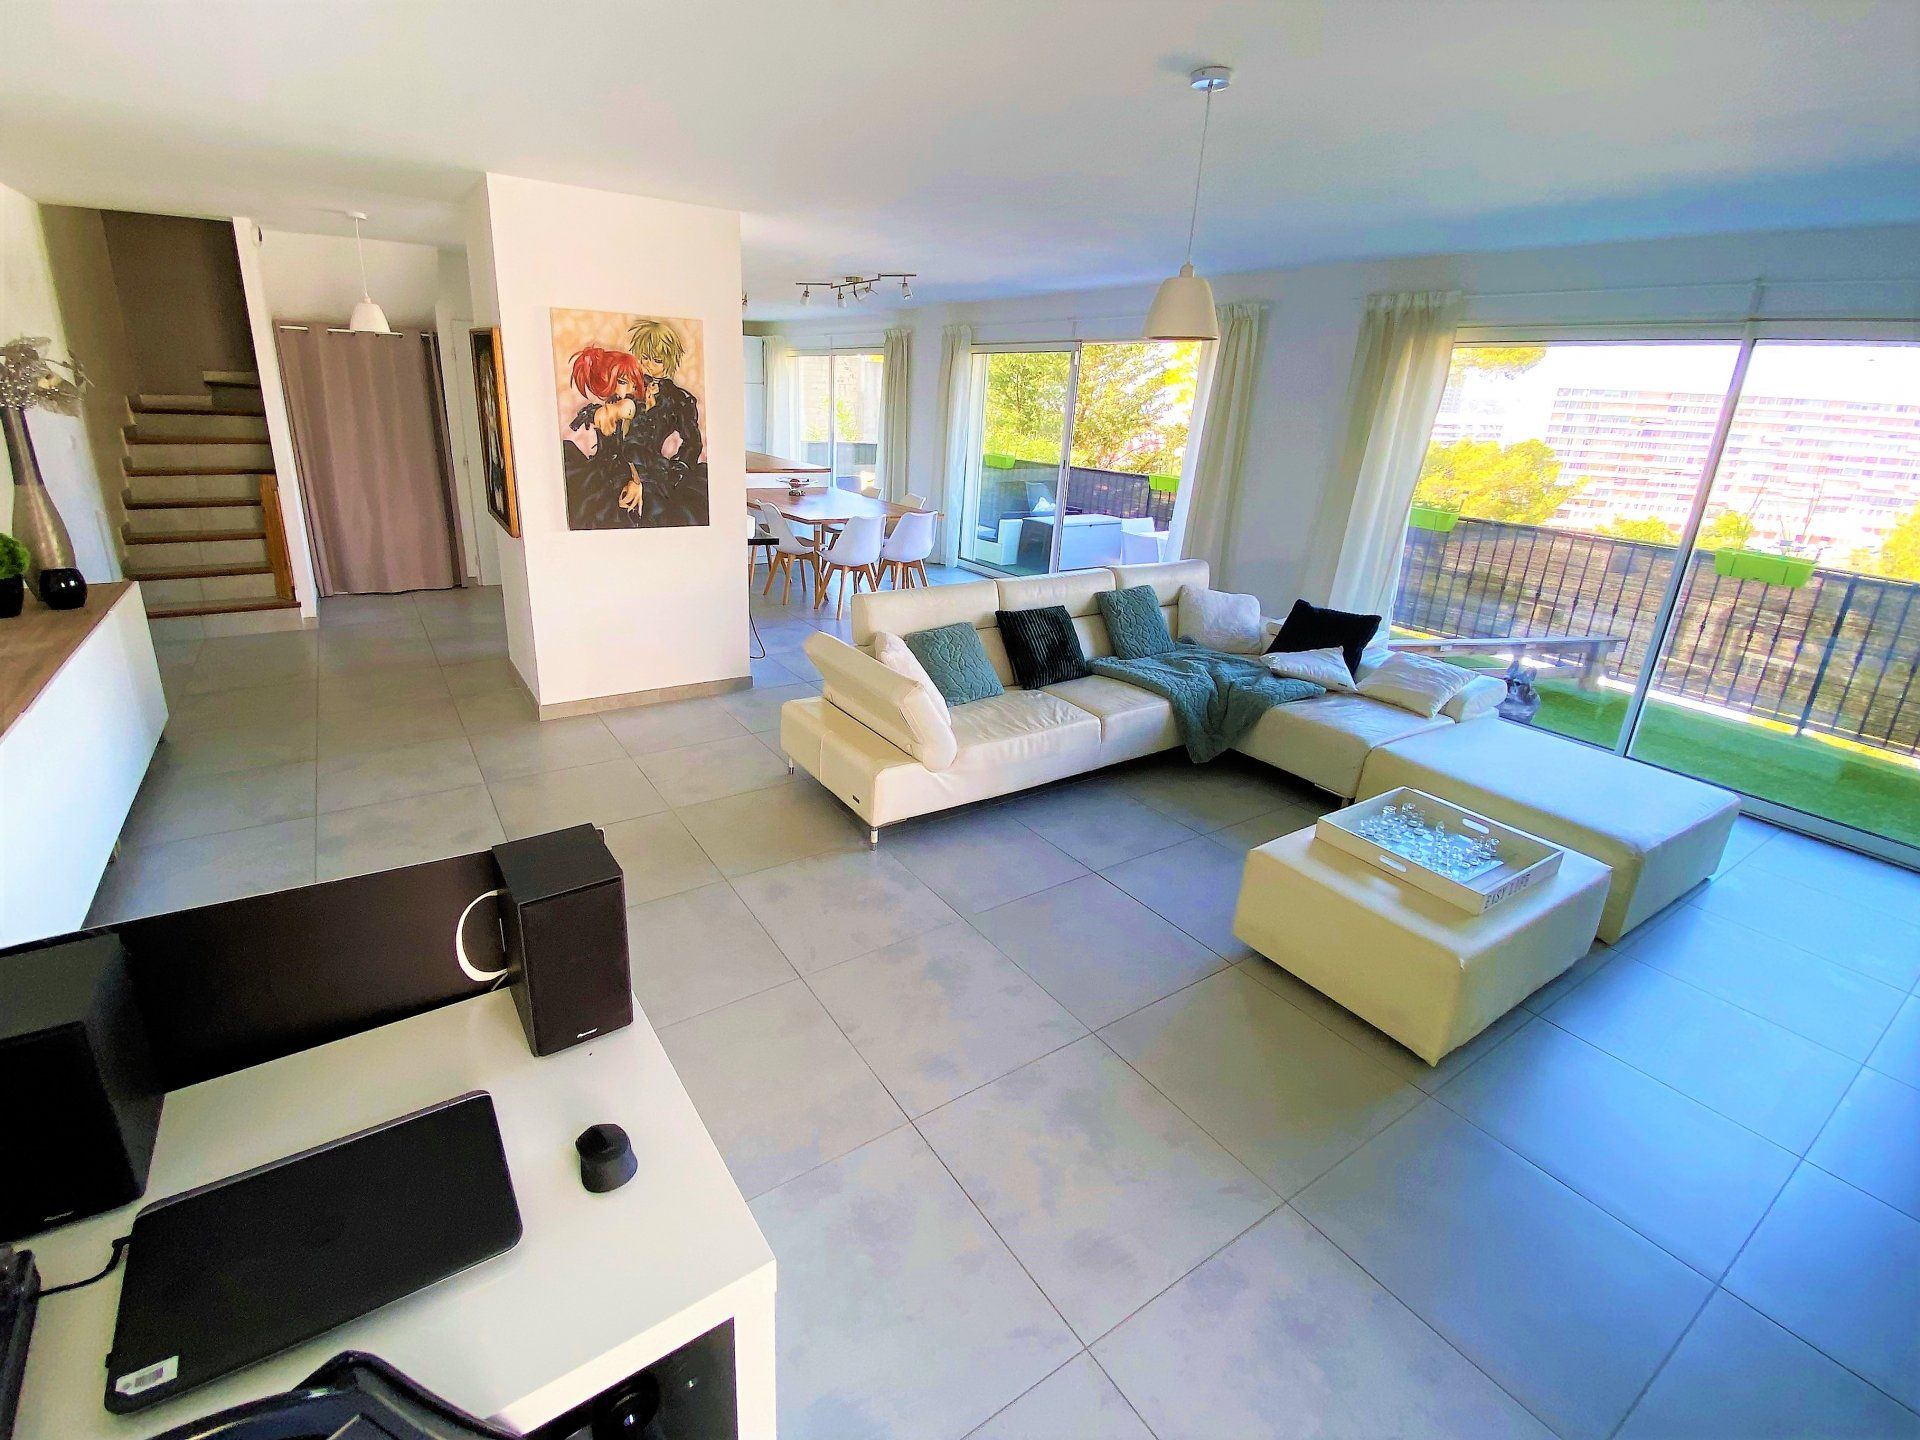 Maison standing, 135 m2, garage, terrasses